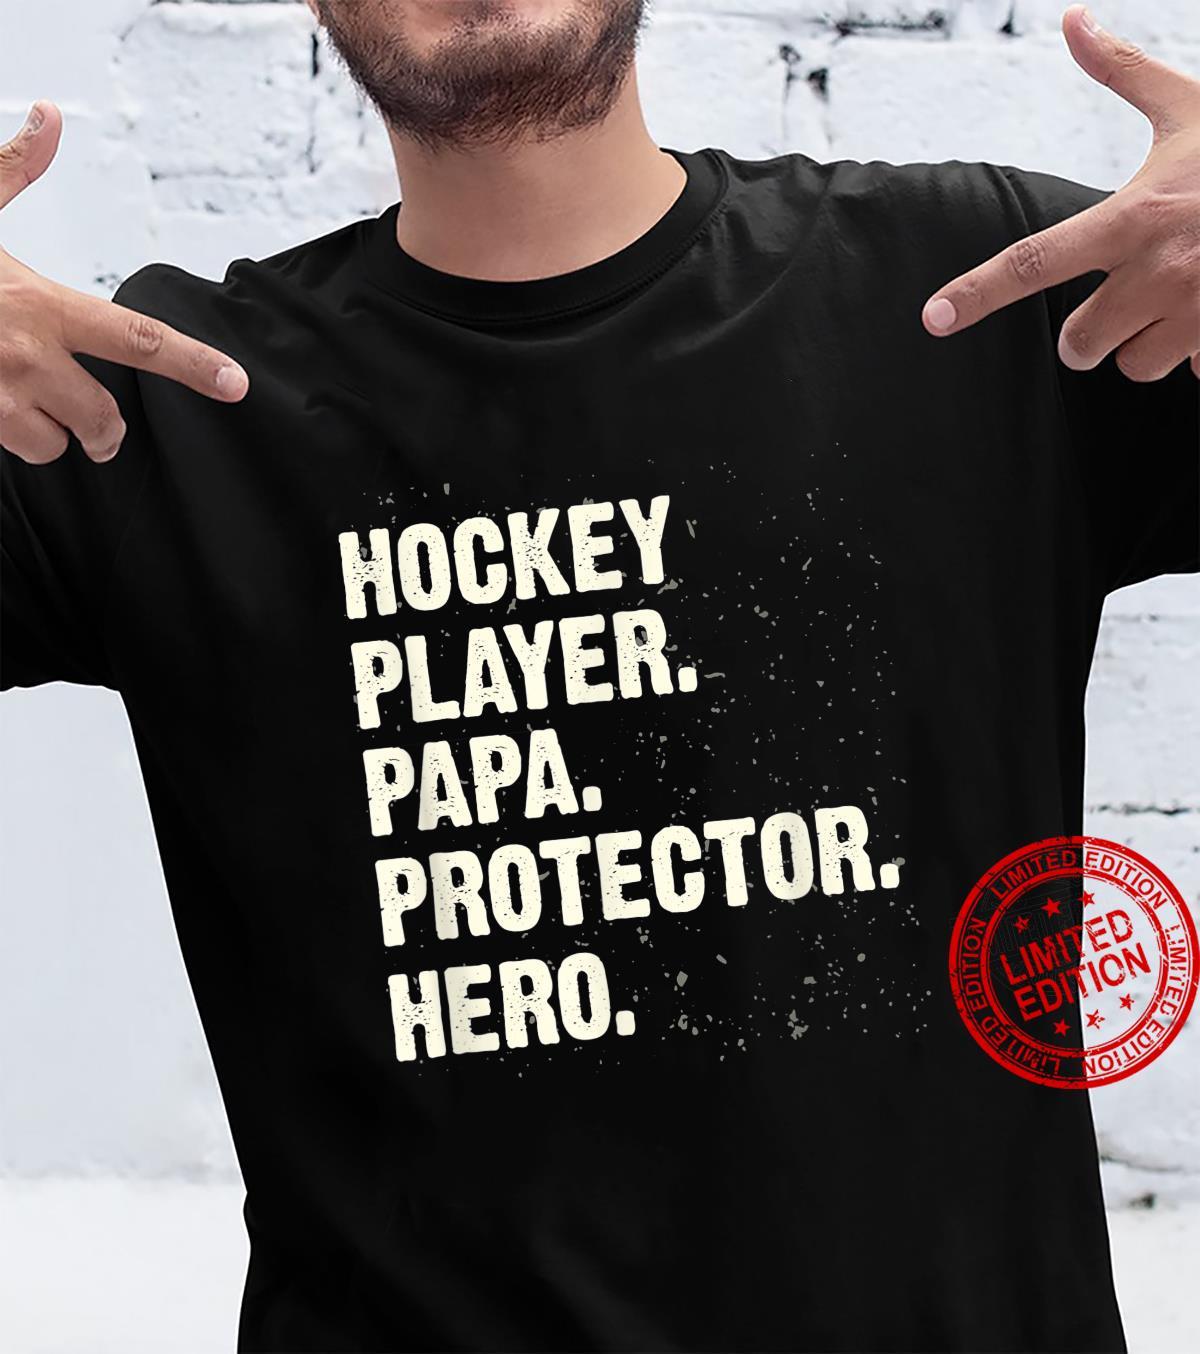 Protector Hero Hockey Player Papa Ice Hockey Dad Profession Shirt